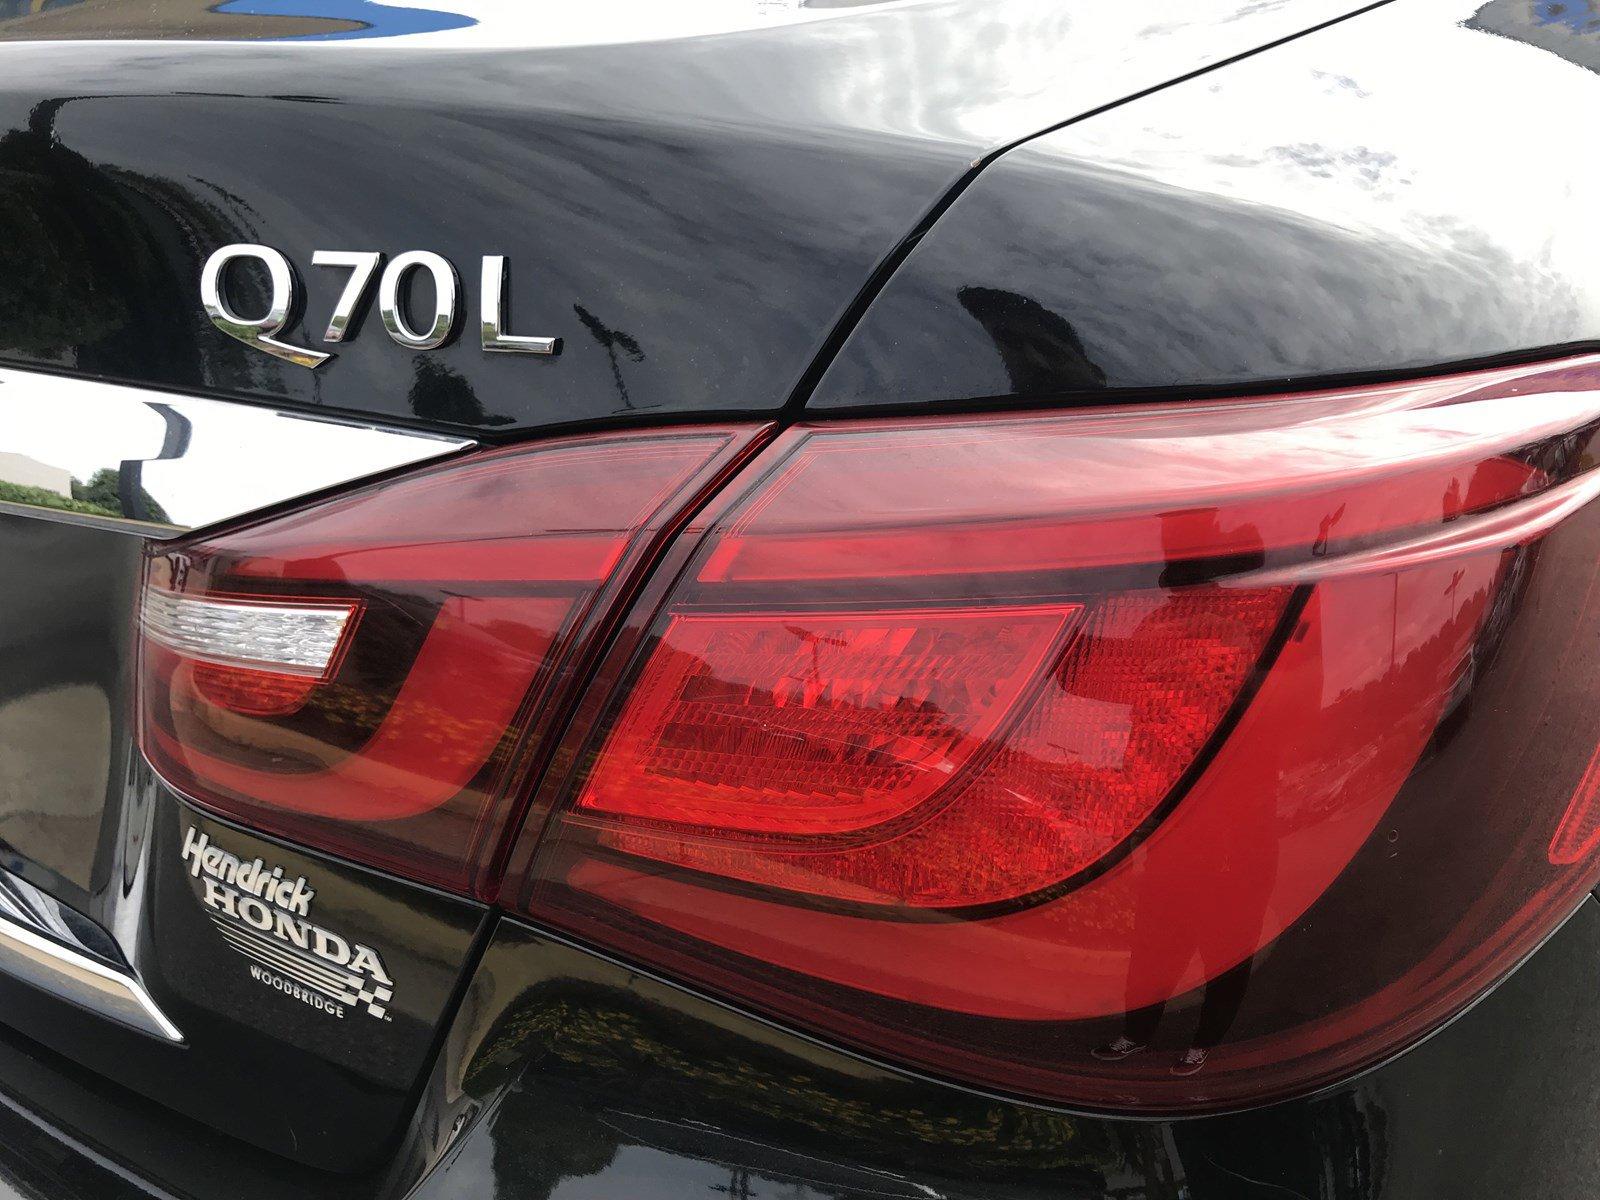 Pre-Owned 2015 INFINITI Q70L 4dr Sdn V6 AWD